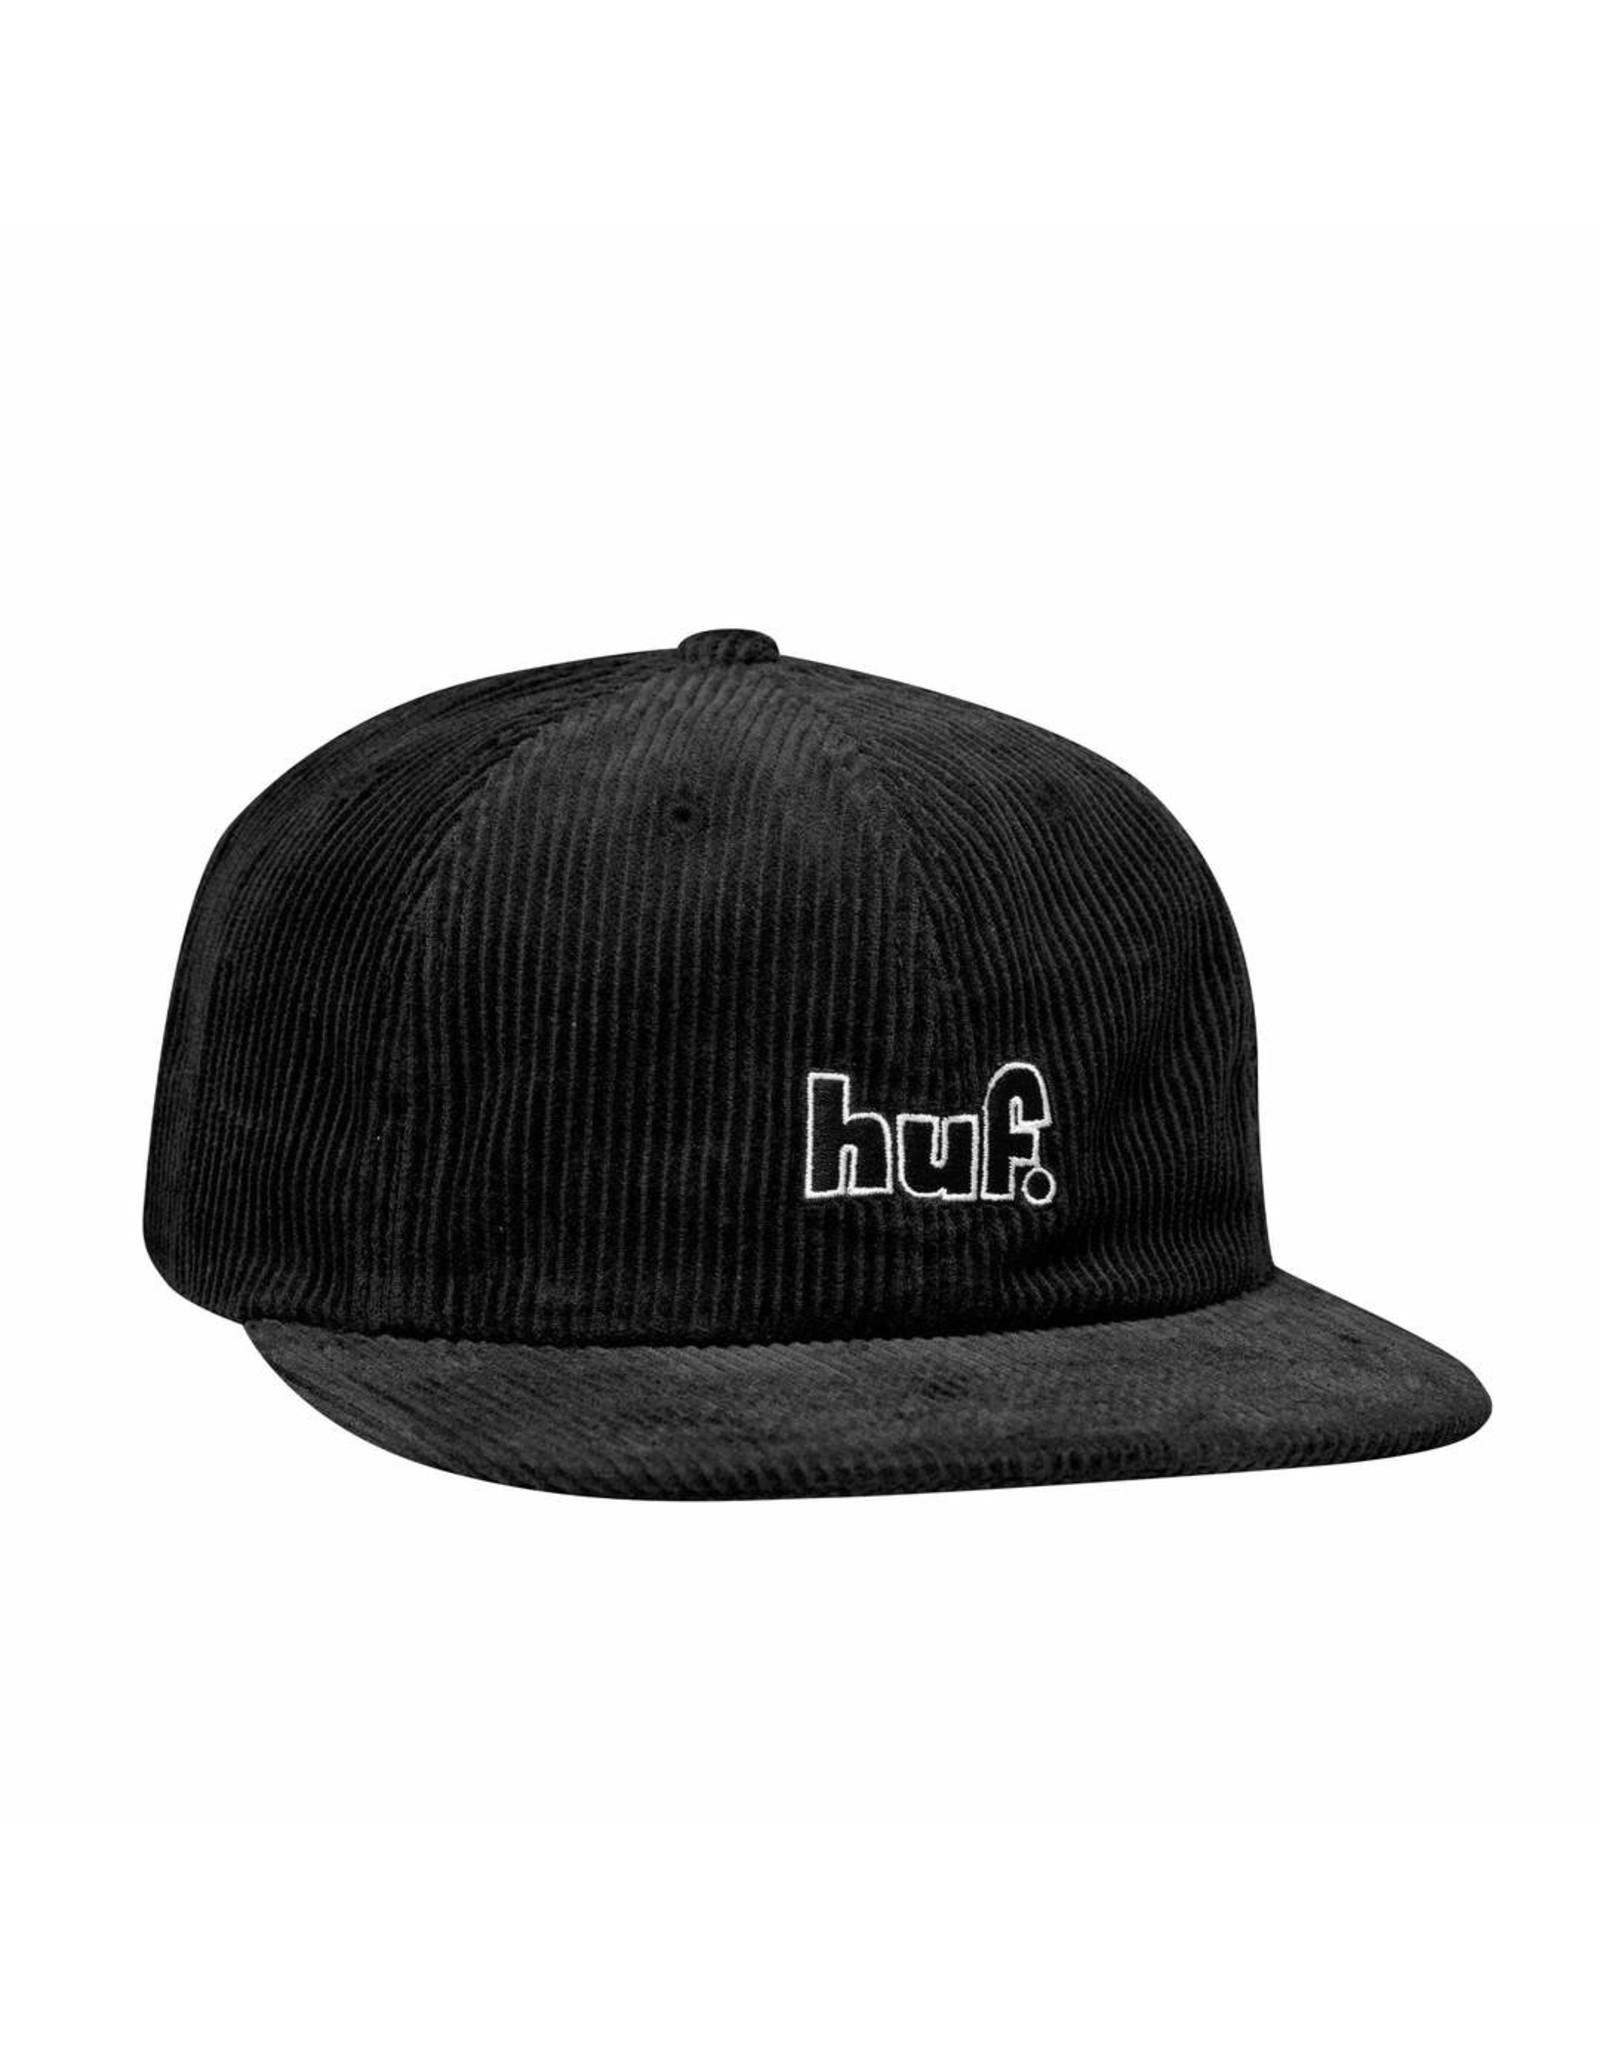 huf` 1993 Logo 6 Panel - Black